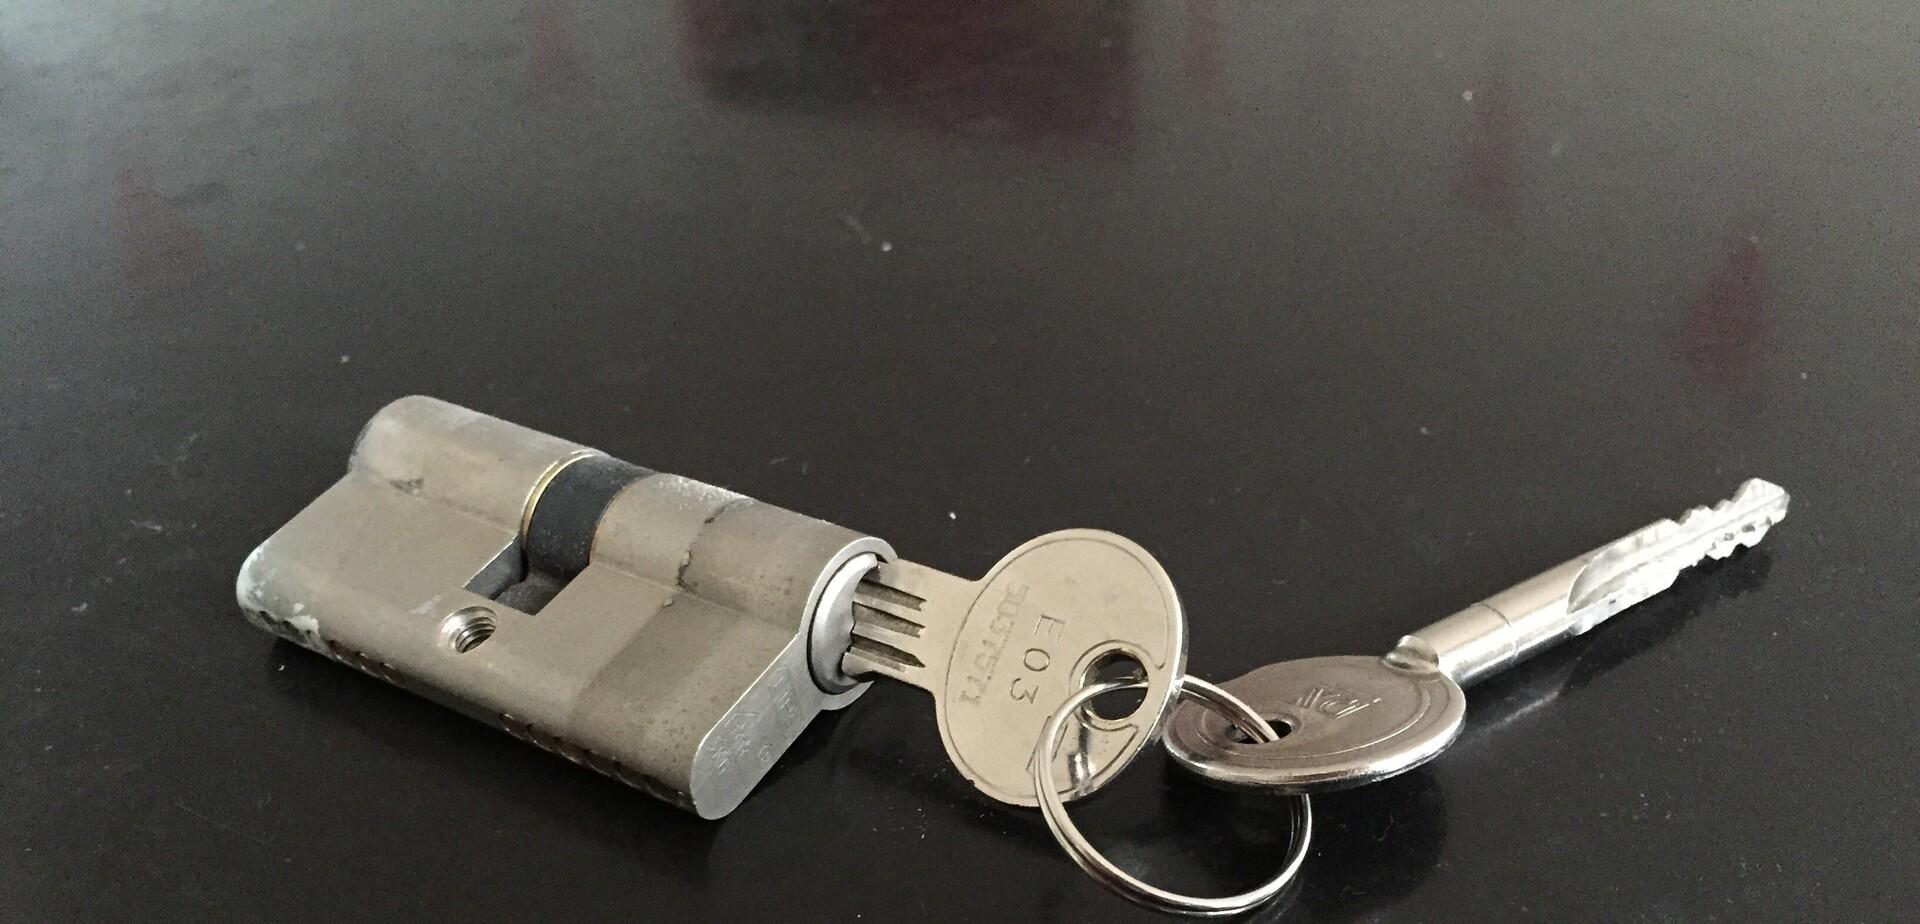 remplacer une serrure cylindre pour les makers. Black Bedroom Furniture Sets. Home Design Ideas